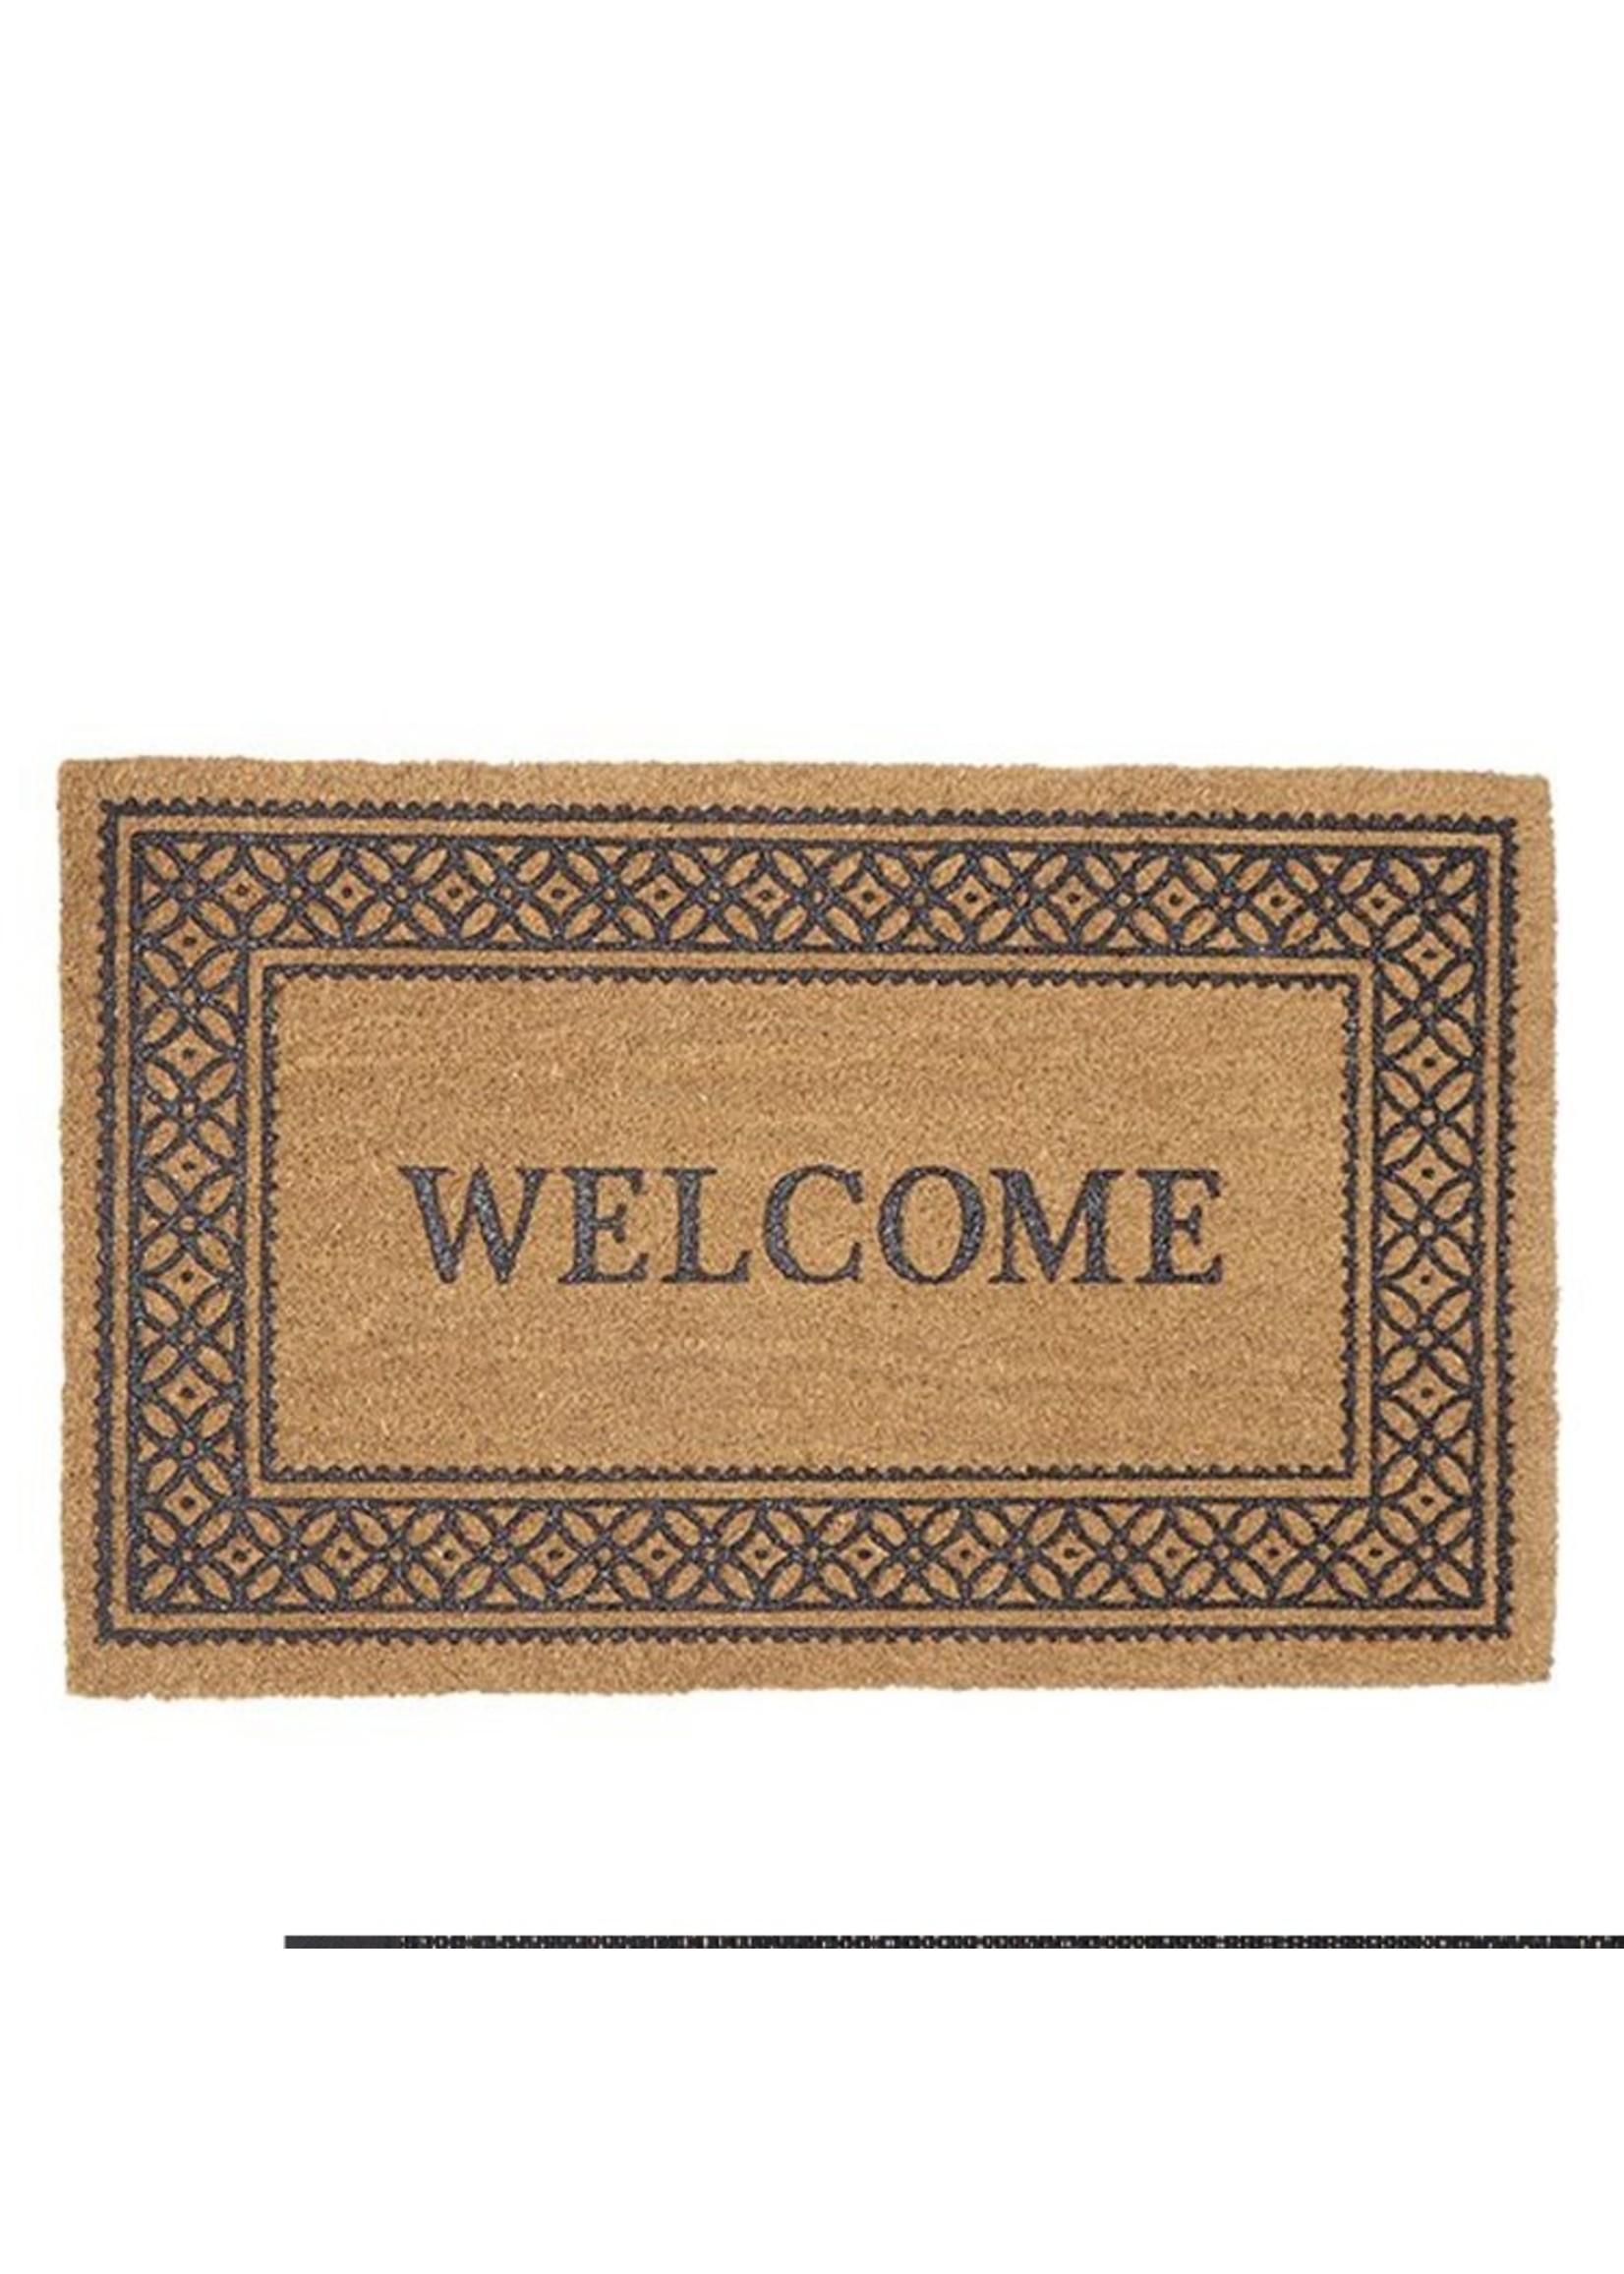 Welcome Printed Coir Mat